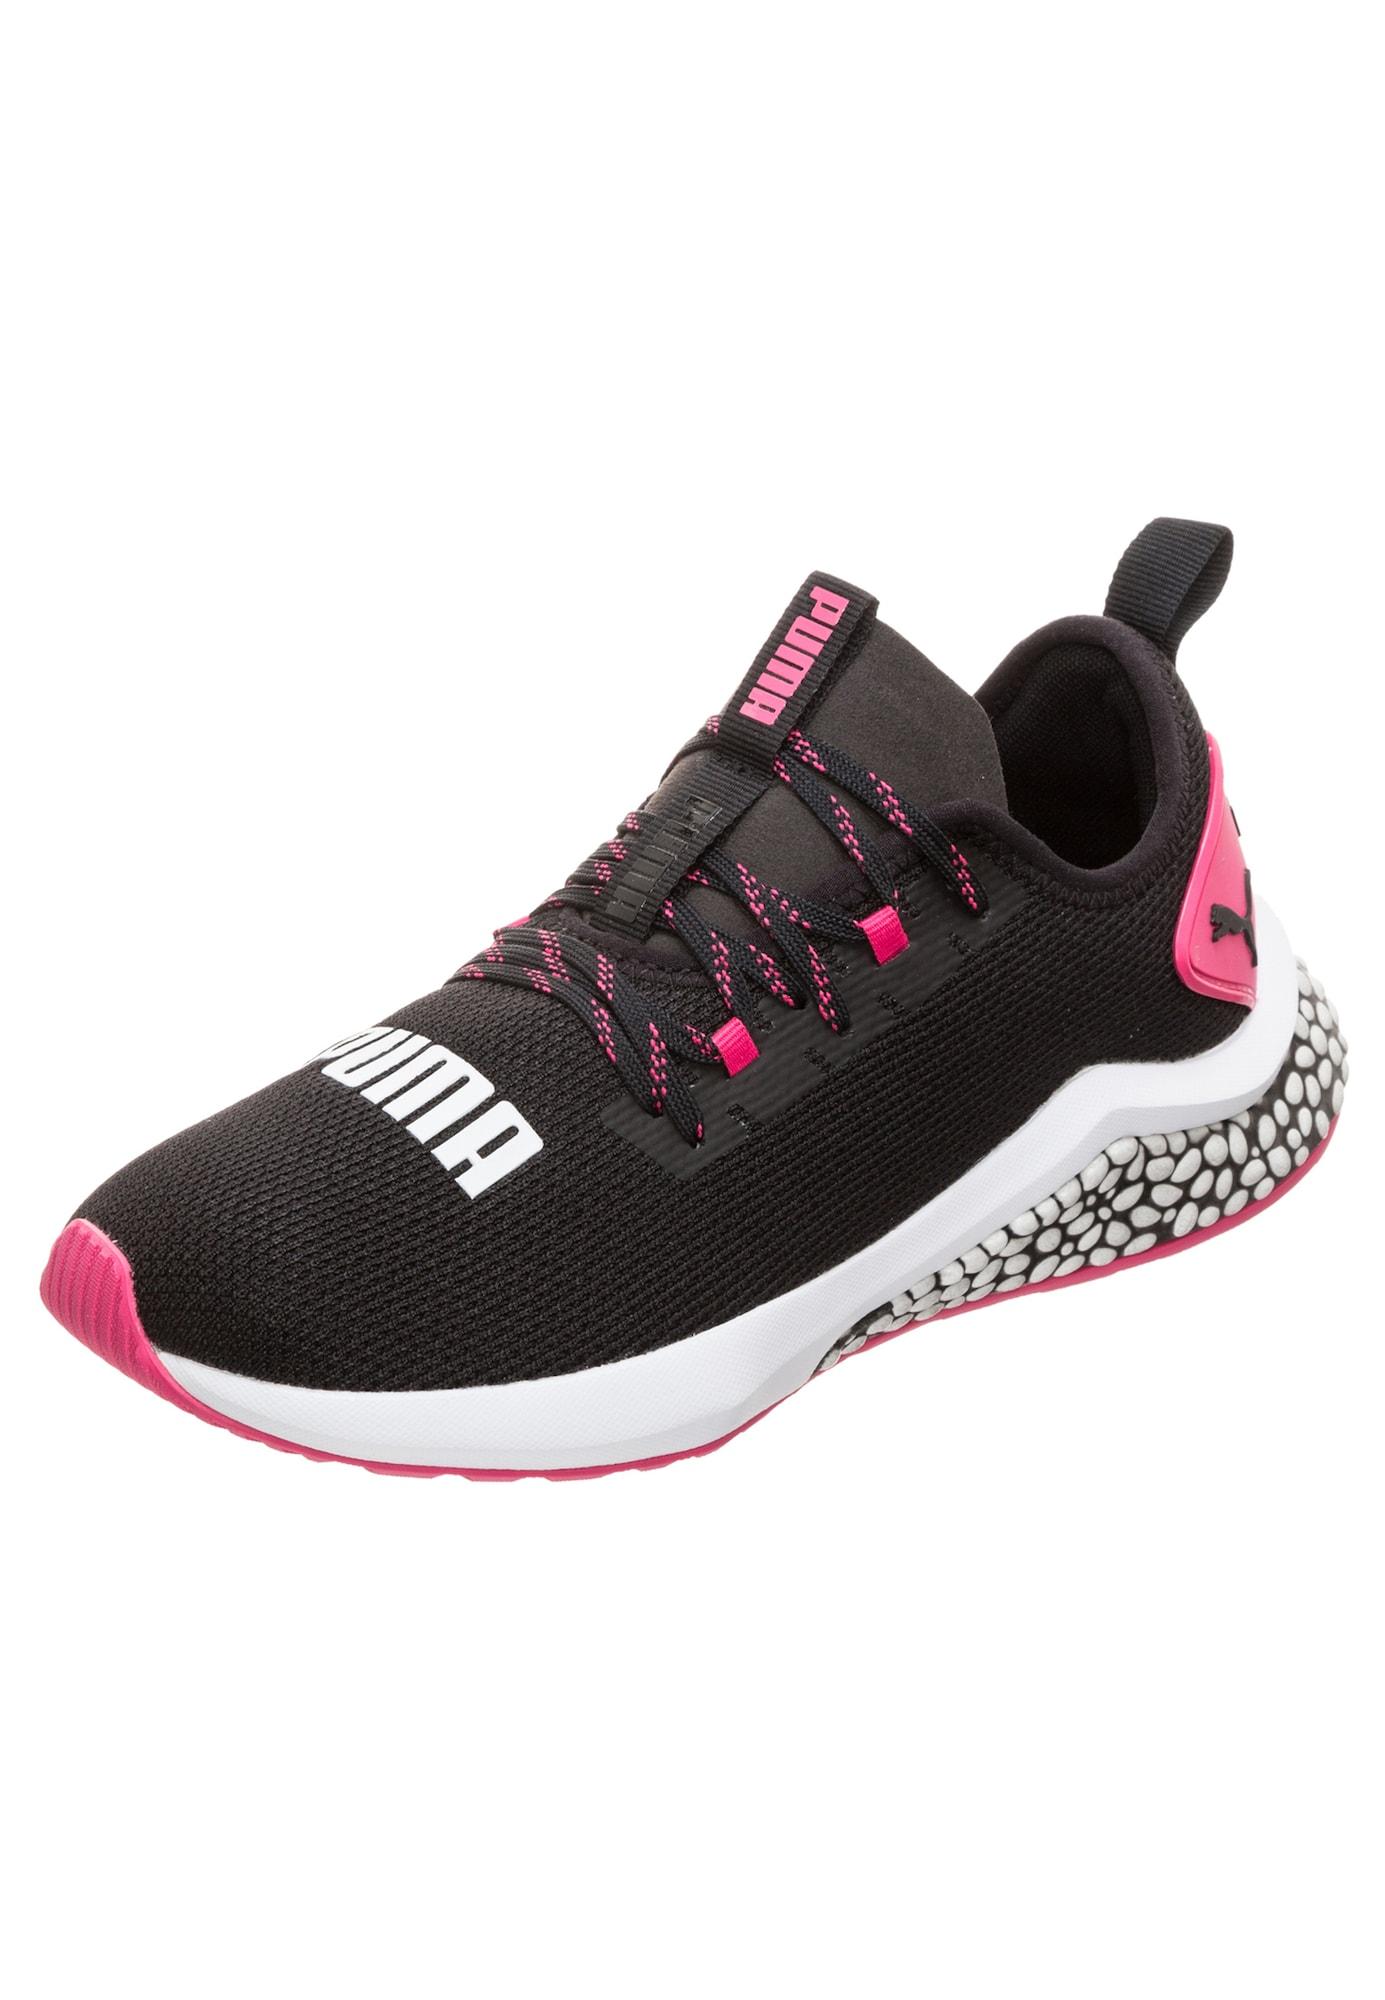 Běžecká obuv Hybrid Nx pink černá bílá PUMA